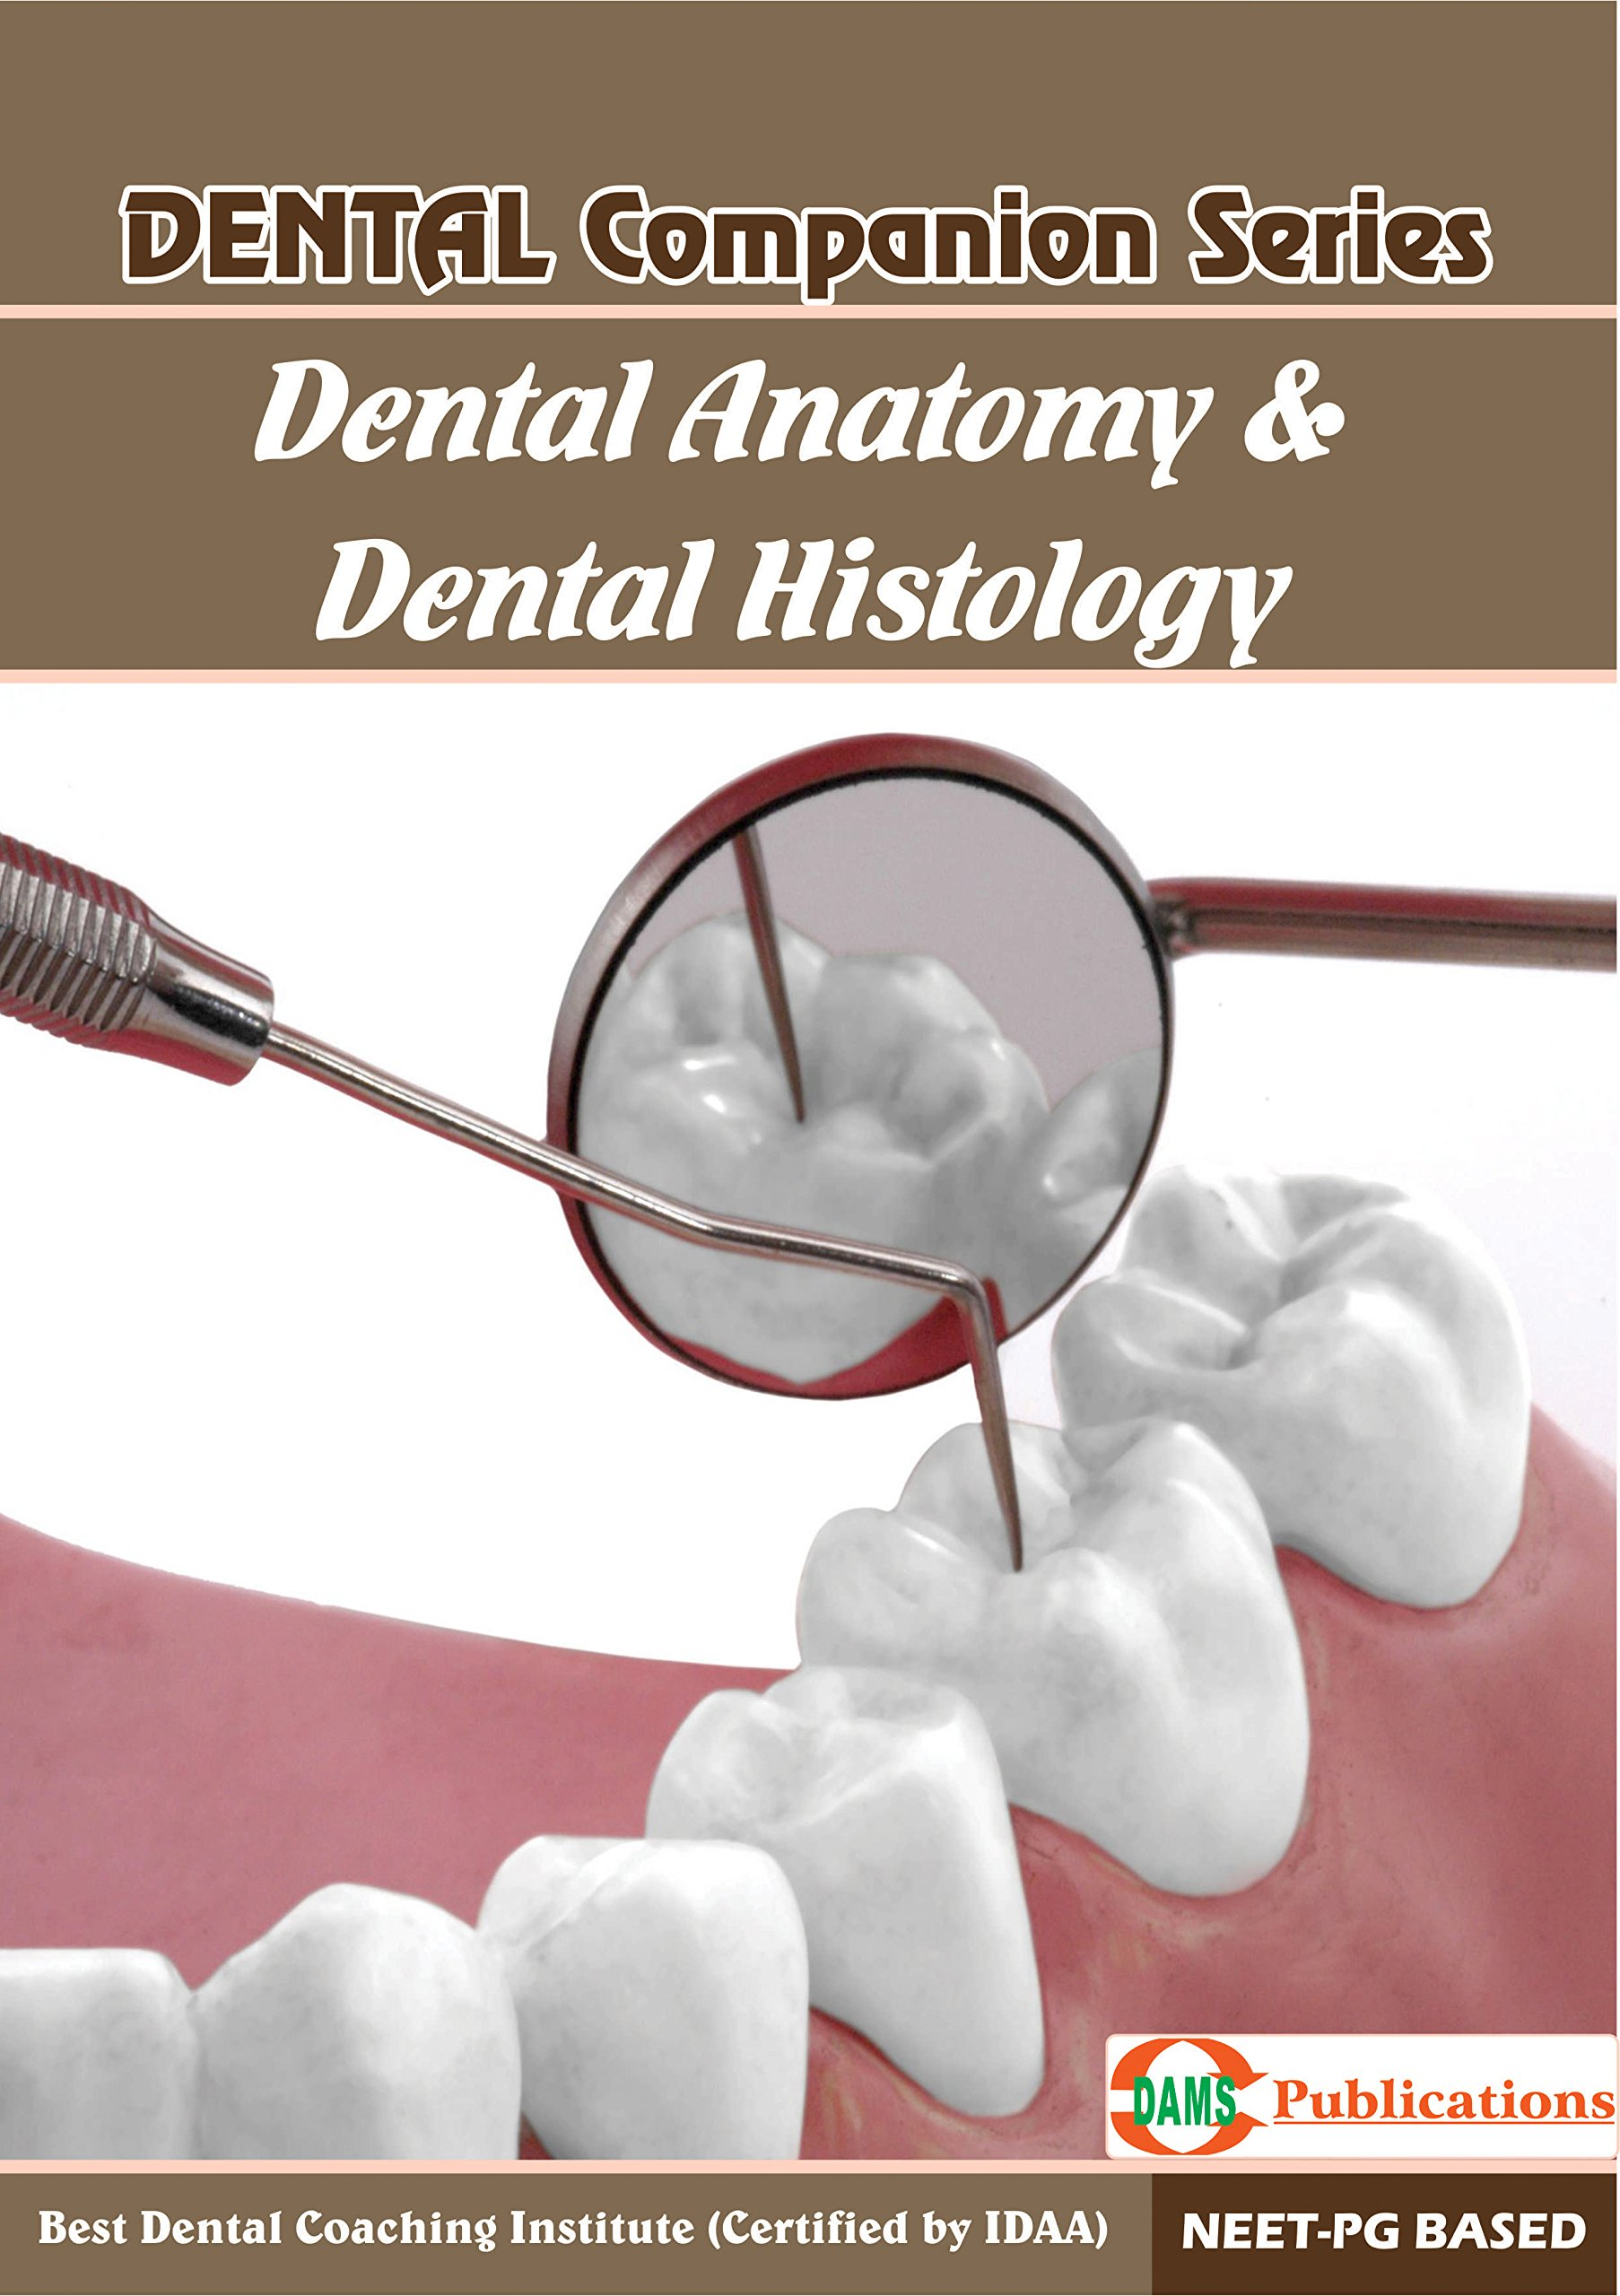 Buy Dams Dental Companion Series Dental Anatomy Dental Histology